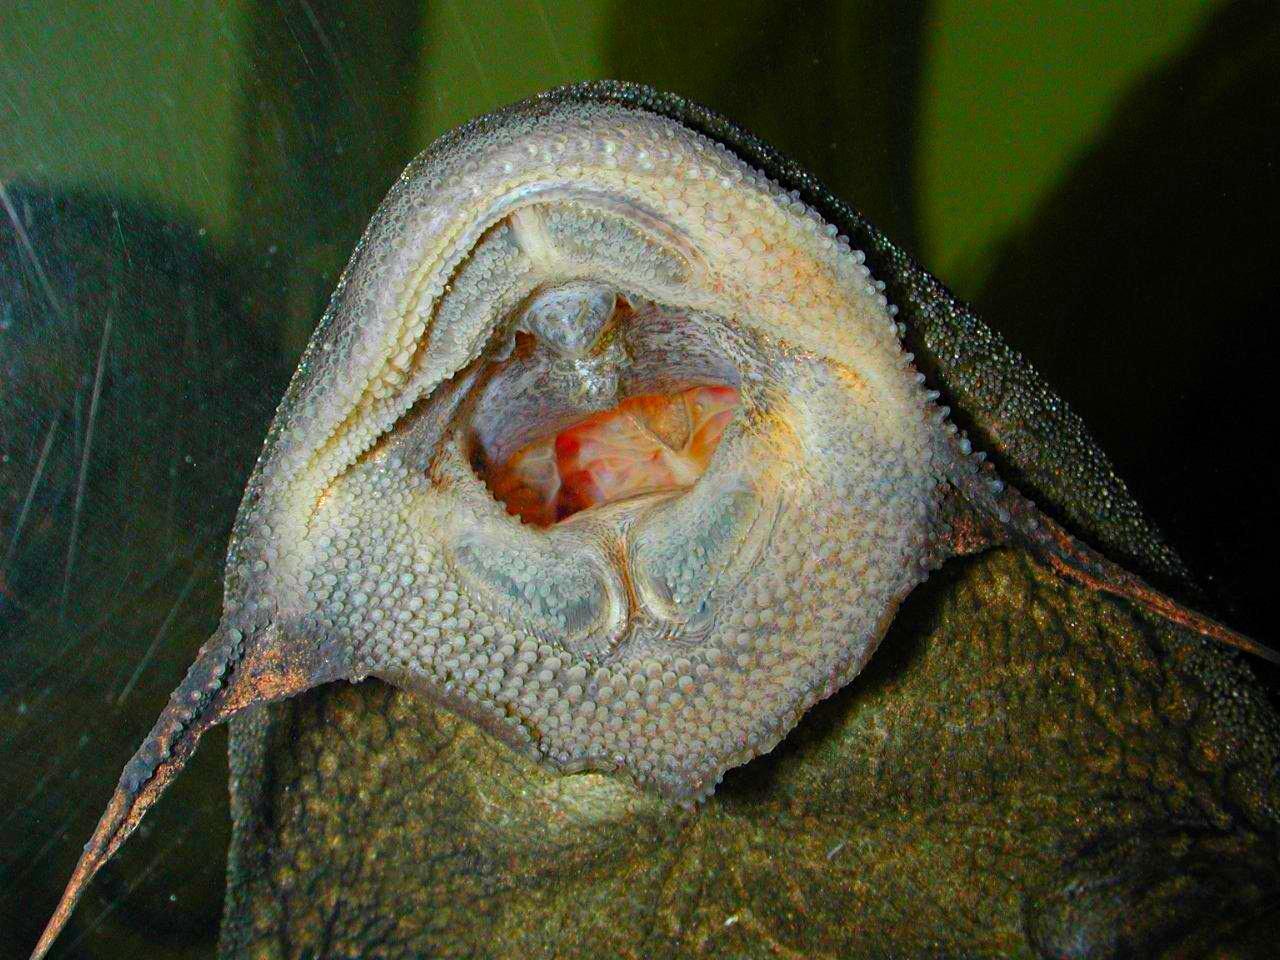 Pet Plecostomus Catfish (1) by Thomas Peace 2013